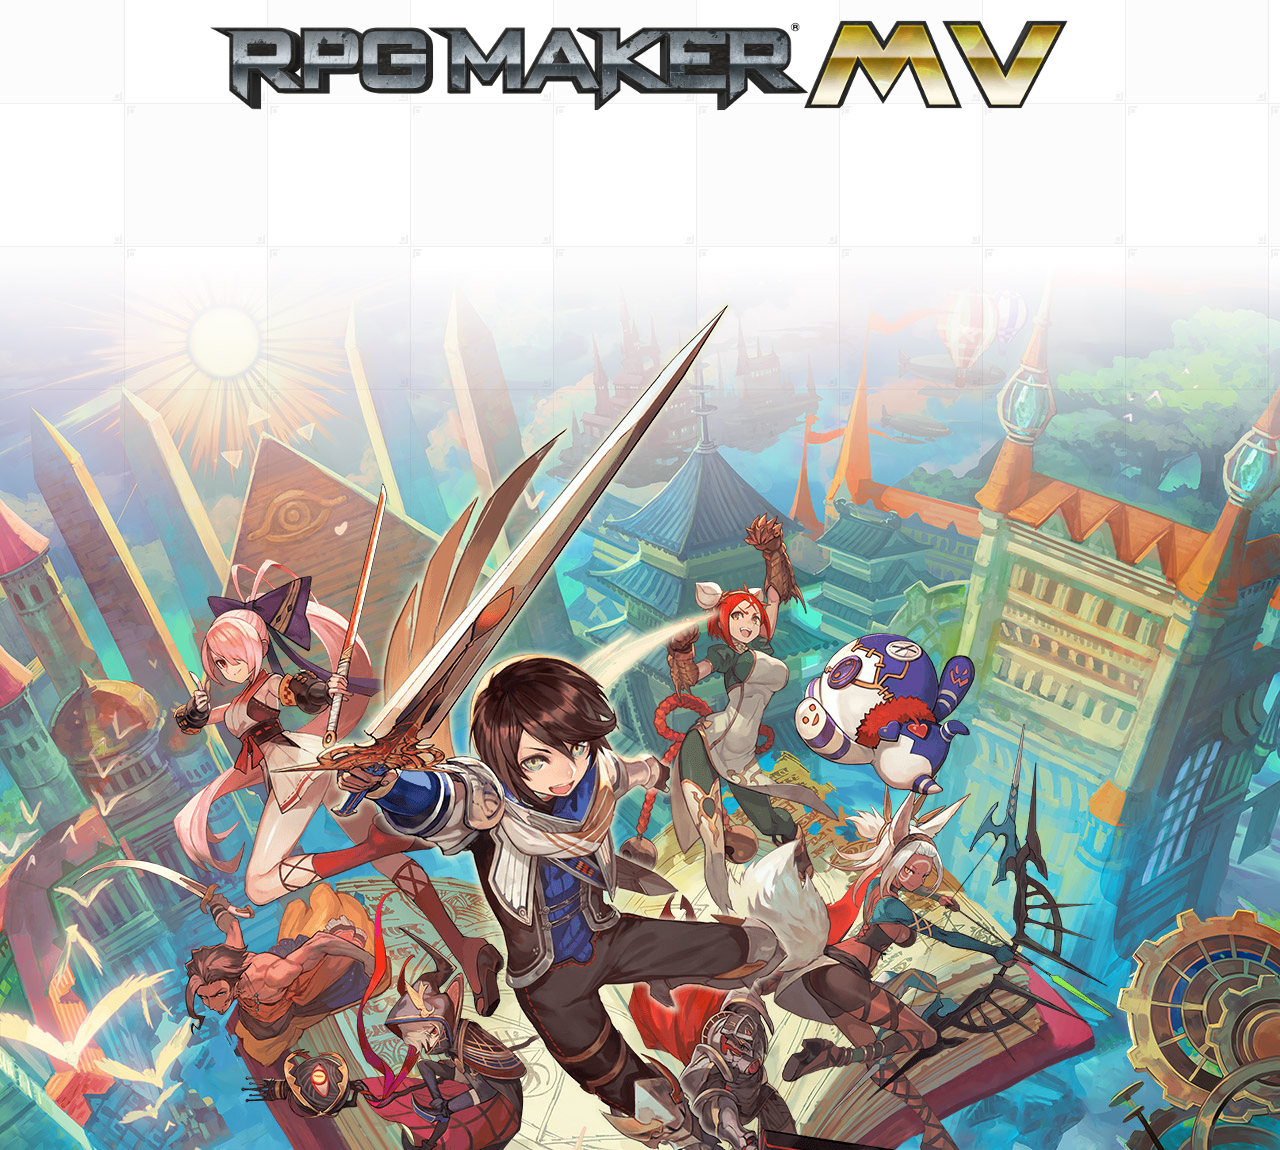 Rpg Maker Mv Switch Review